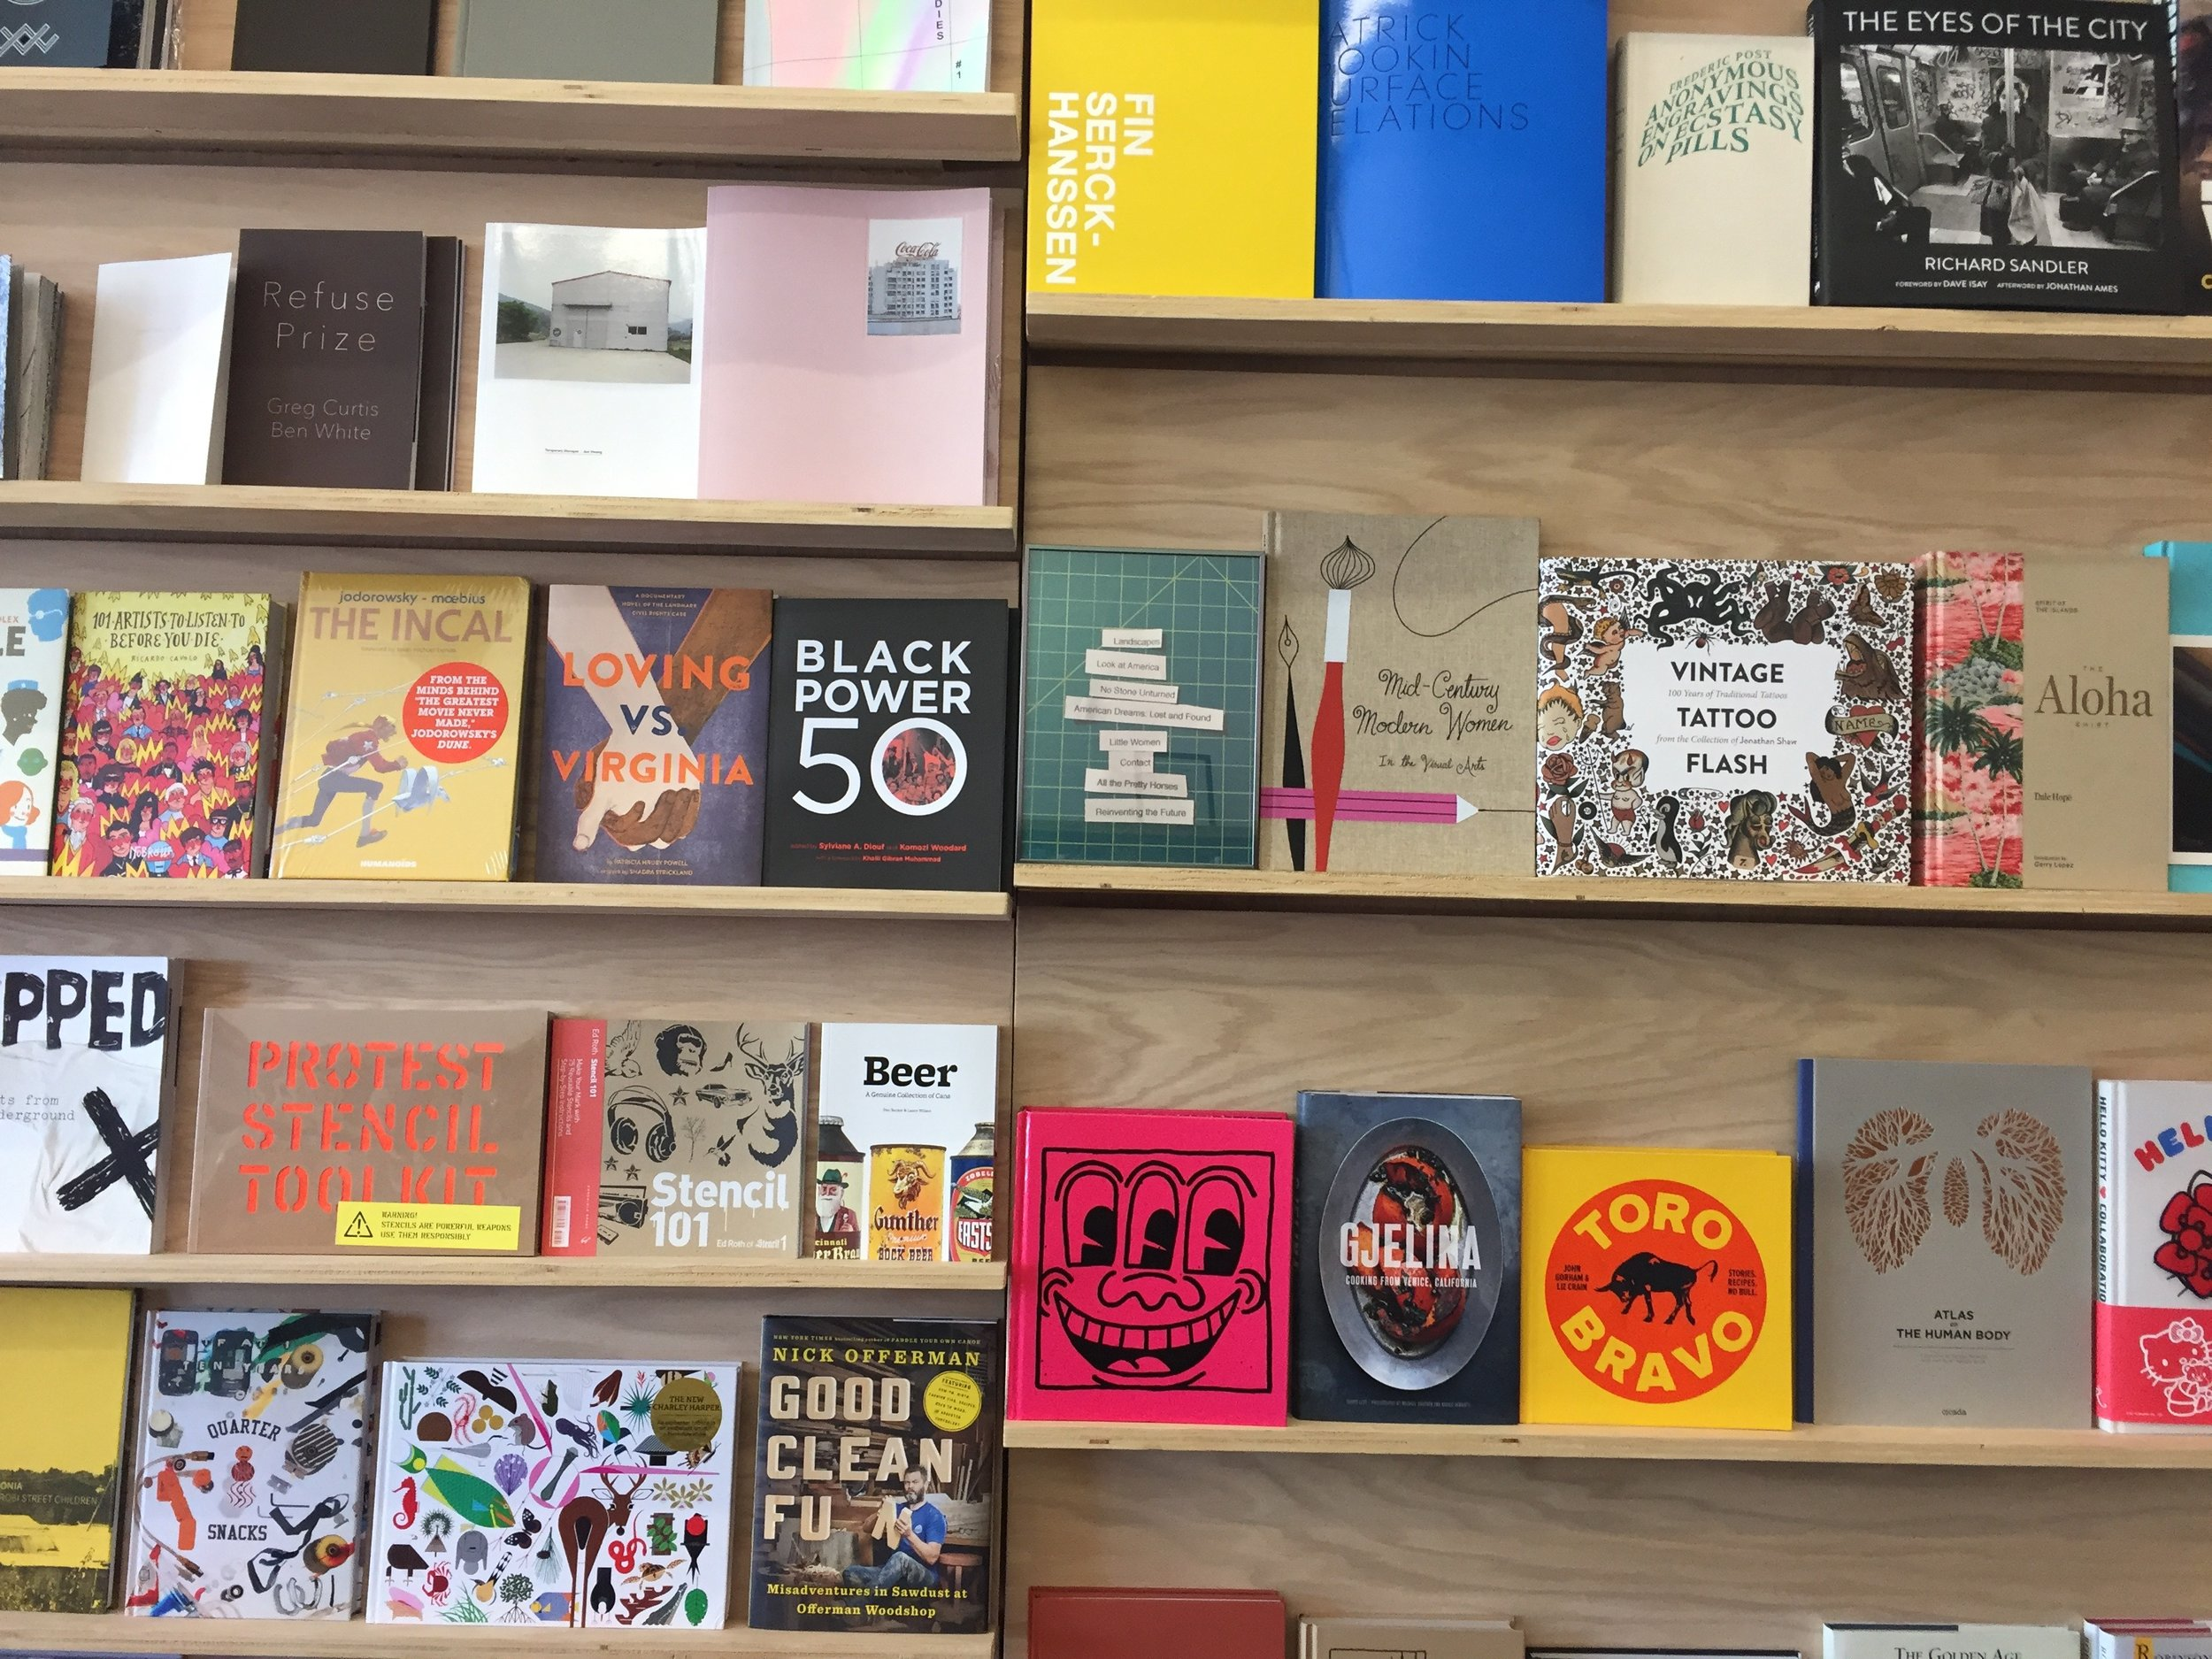 Double Positive,  2017  Sandstone, felt, used books, poem,framed ink jet prints  Installed in PopHop Books, Los Angeles, 2017  In collaboration with  Susanna Battin